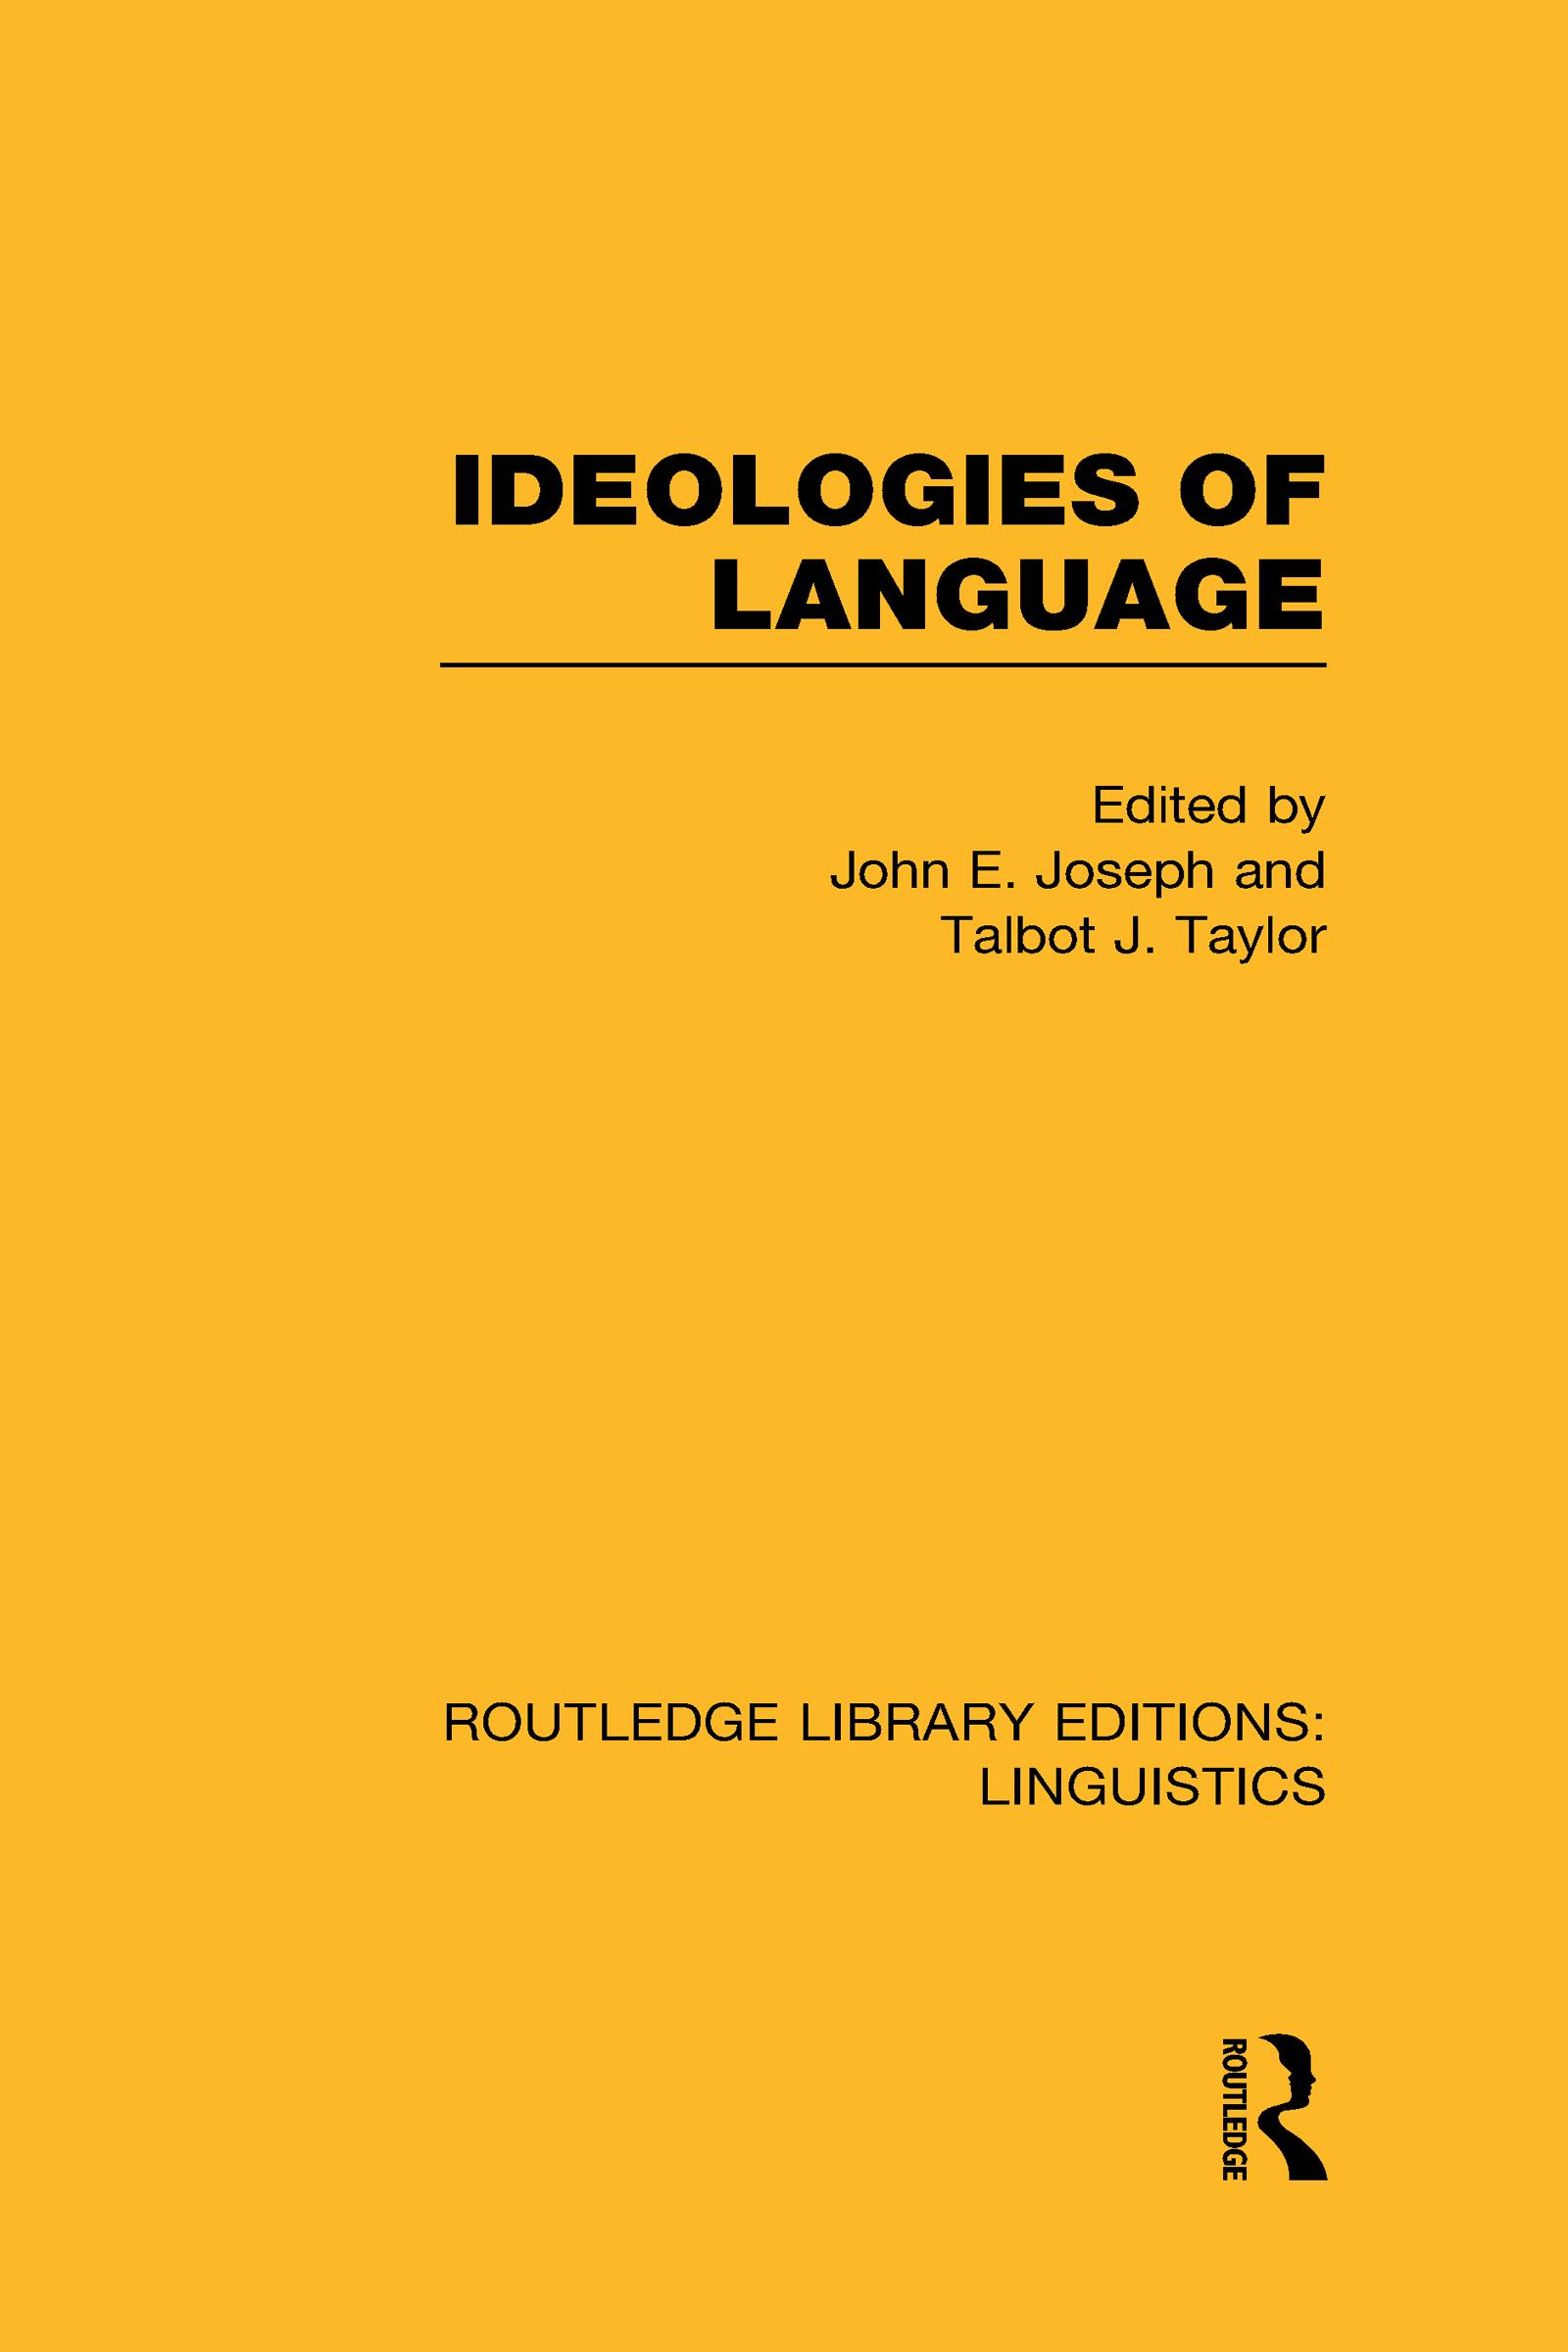 Ideologies of Language (RLE Linguistics A: General Linguistics) (Hardback) book cover